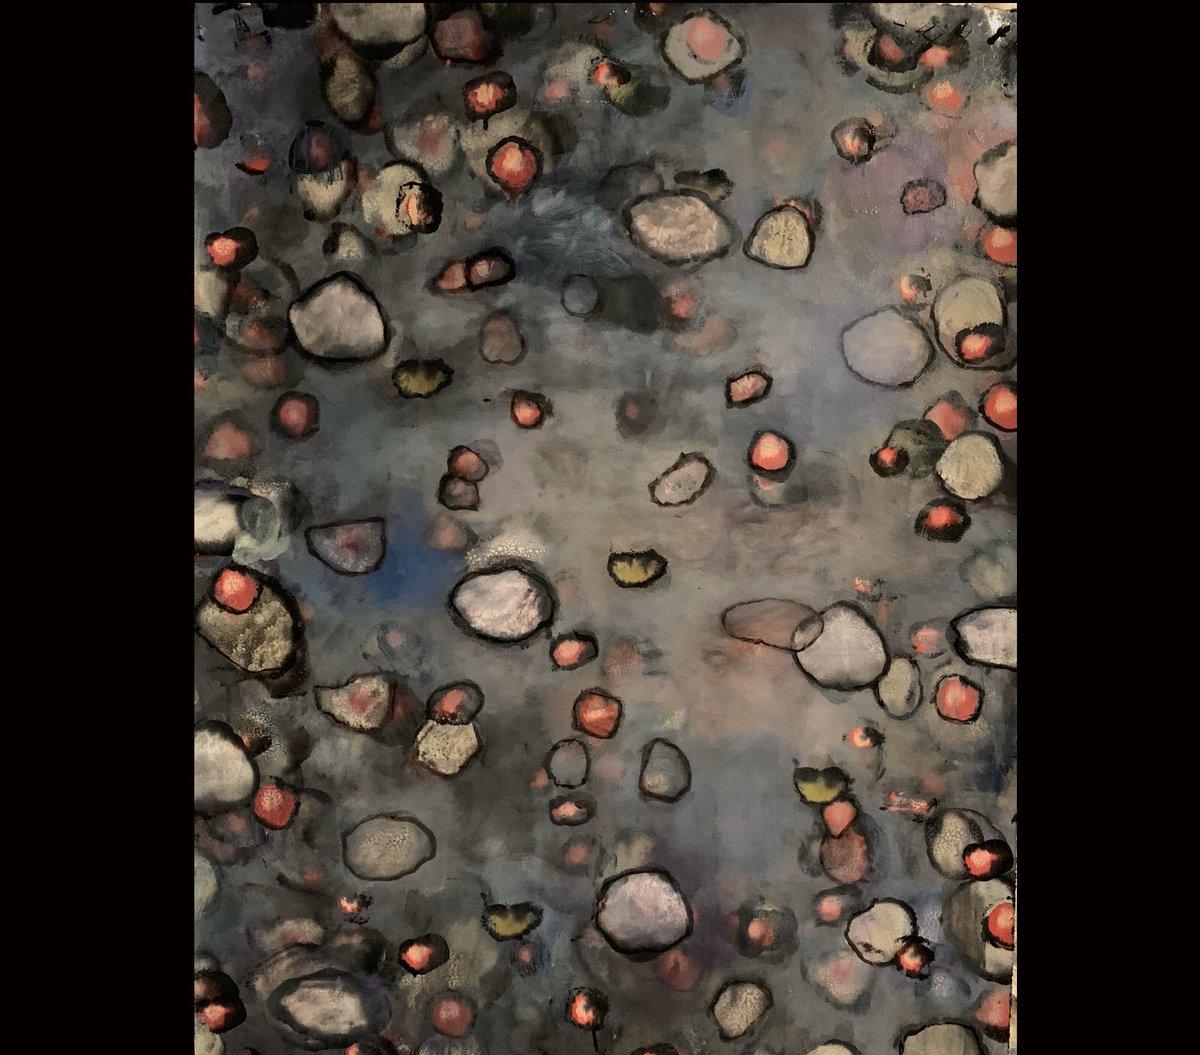 "'Without a Doubt' 42""x 30"", #acrylic on paper #acrylicpainting #pintura #acrilico #pittura #peinture #malerei #abstractart #arteabstracto #abstraktekunst #abstractpainting #oaklandartist #galleryart… pic.twitter.com/aIQXQ2PcXD"